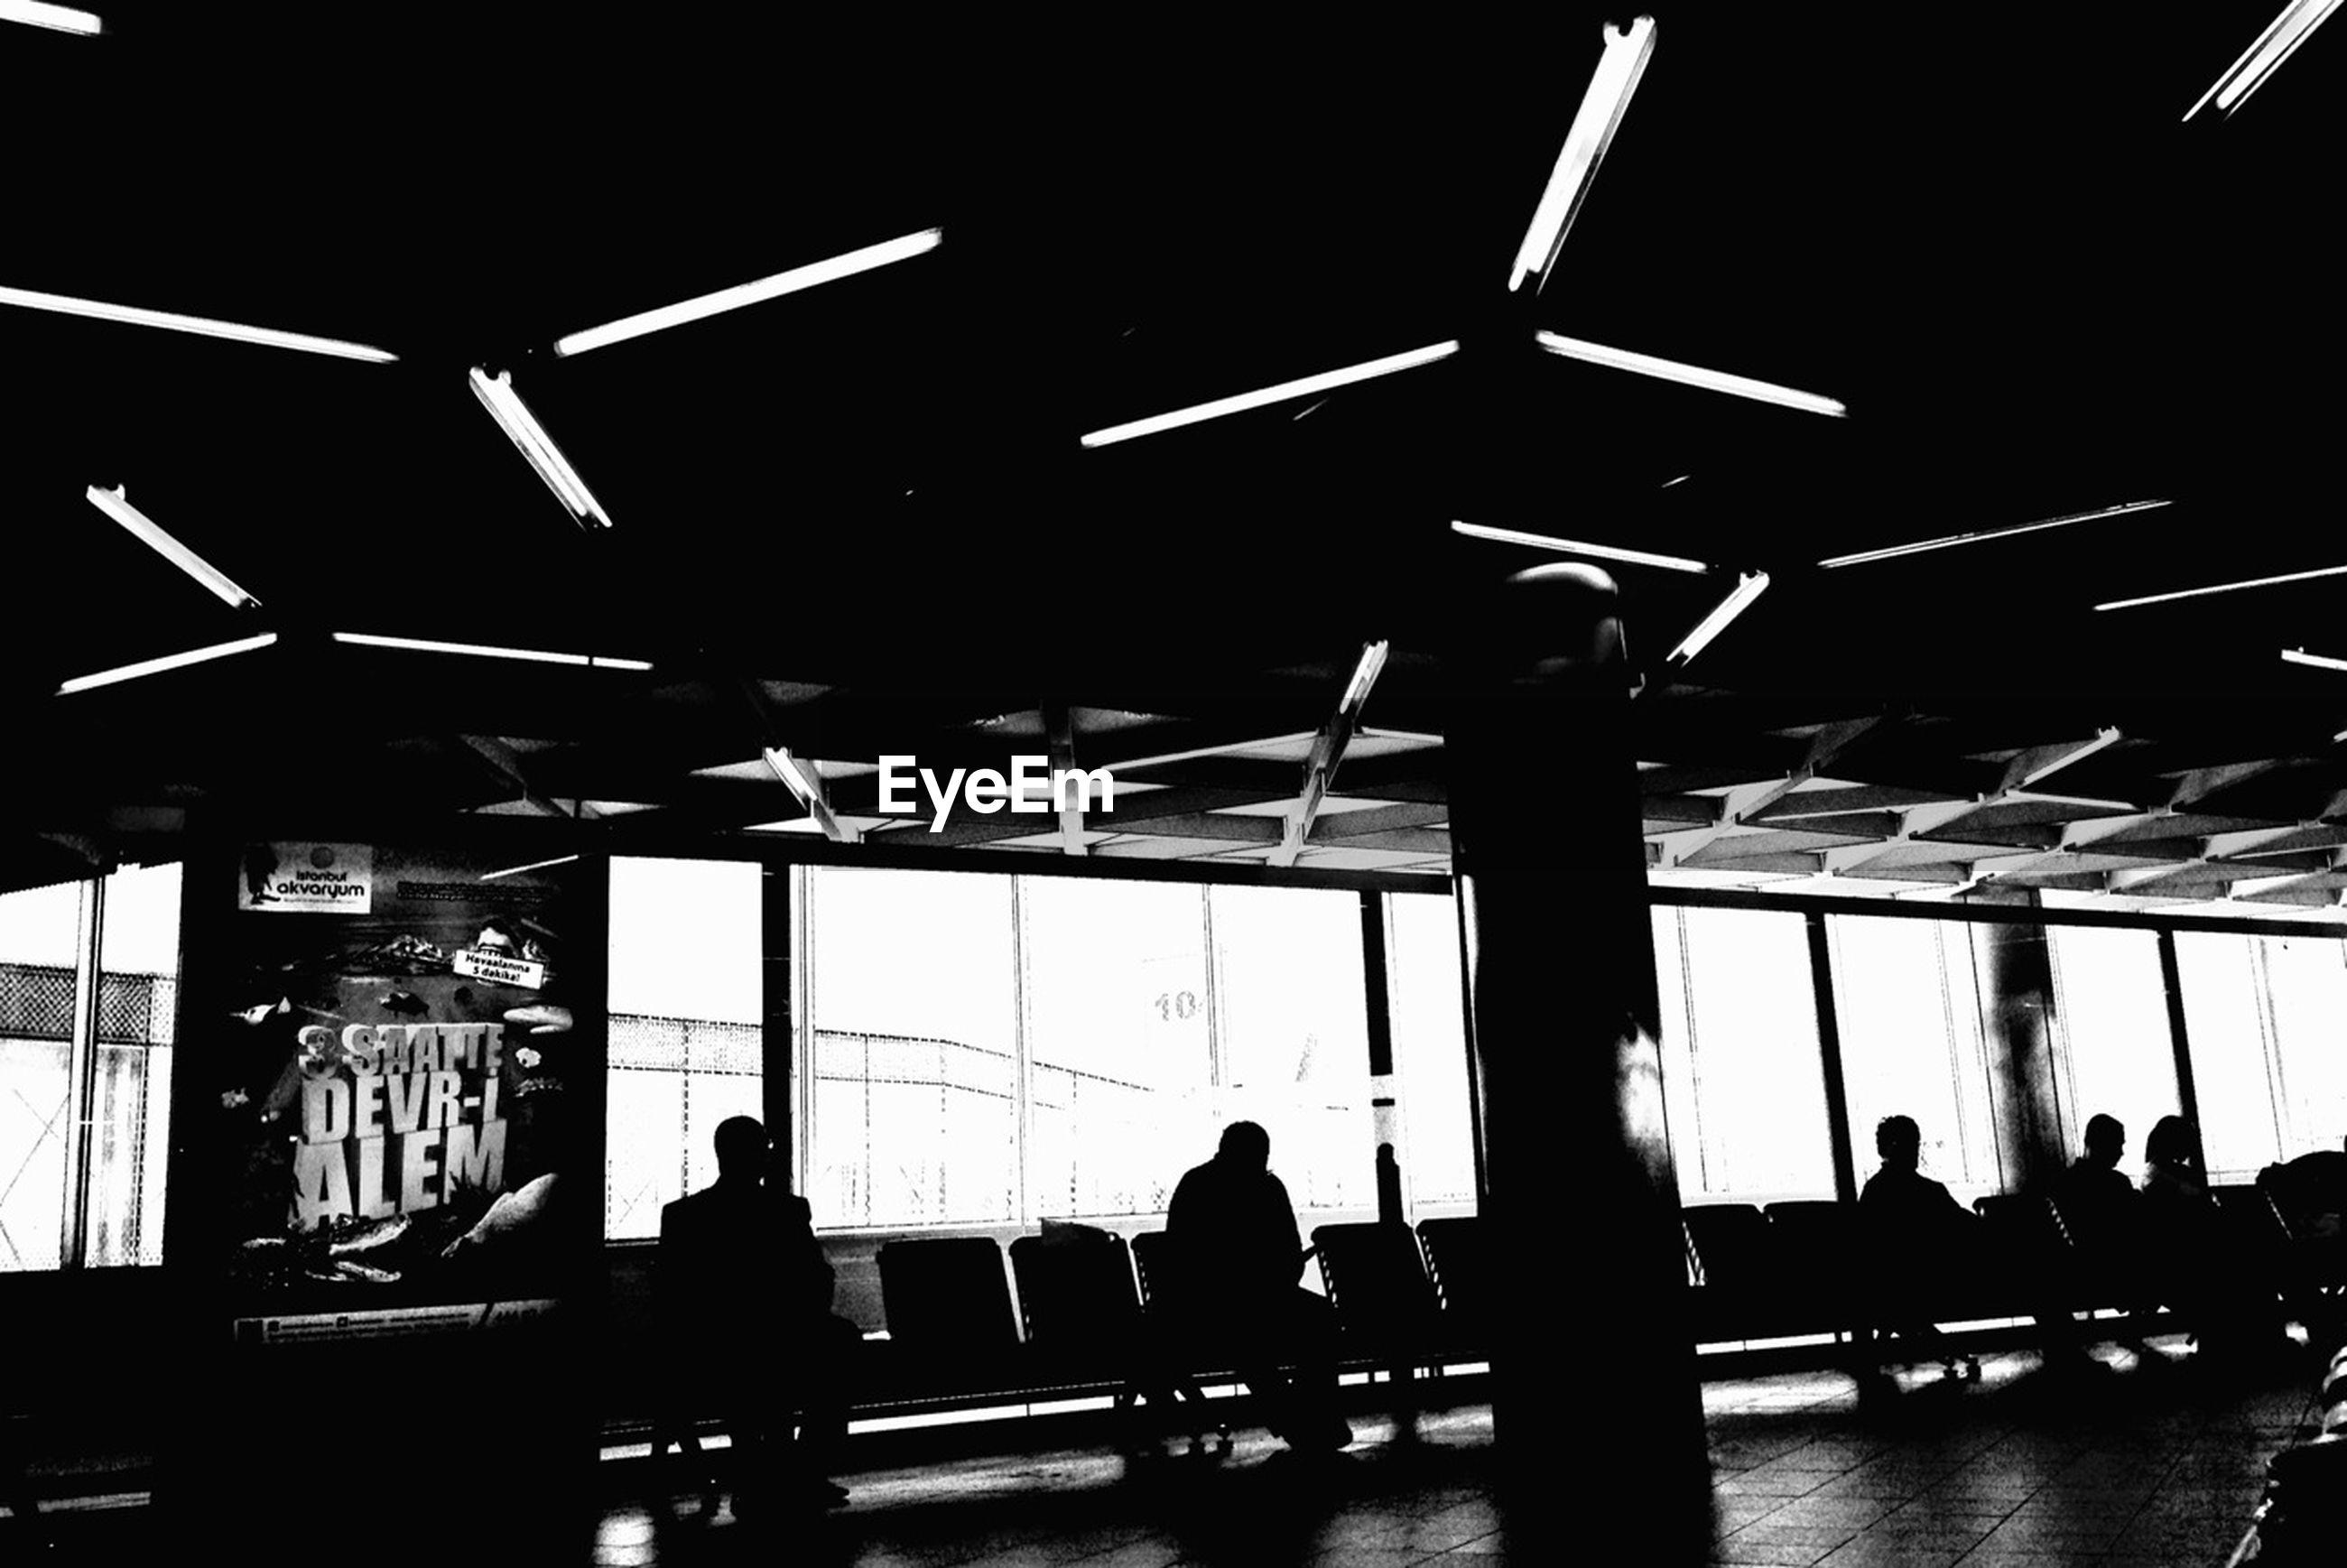 silhouette, indoors, men, lifestyles, illuminated, person, night, leisure activity, standing, airport, medium group of people, built structure, walking, large group of people, group of people, outline, city life, dark